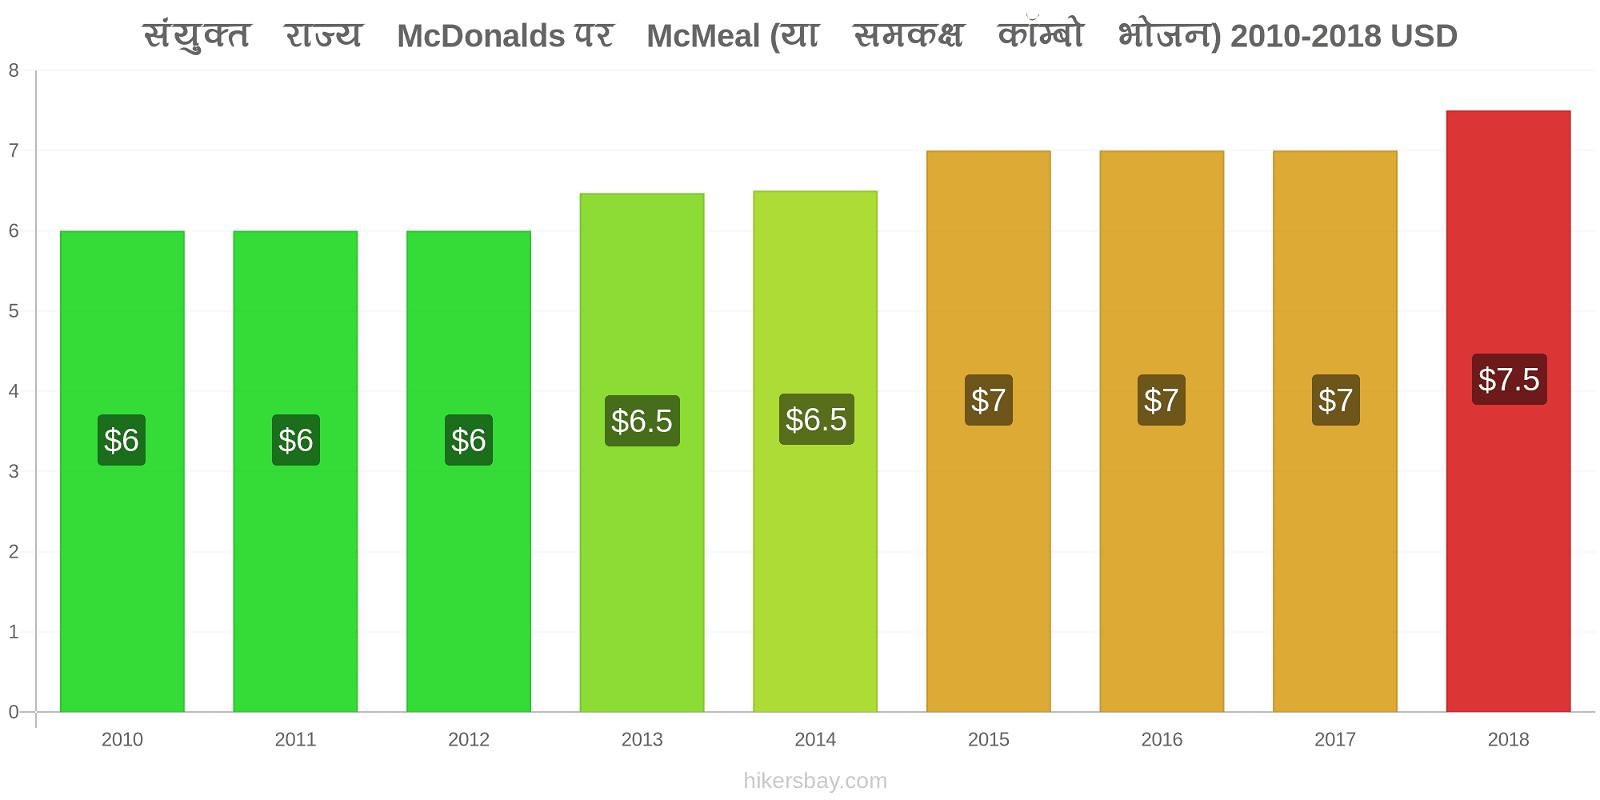 संयुक्त राज्य मूल्य परिवर्तन McDonalds पर McMeal (या समकक्ष कॉम्बो भोजन) hikersbay.com